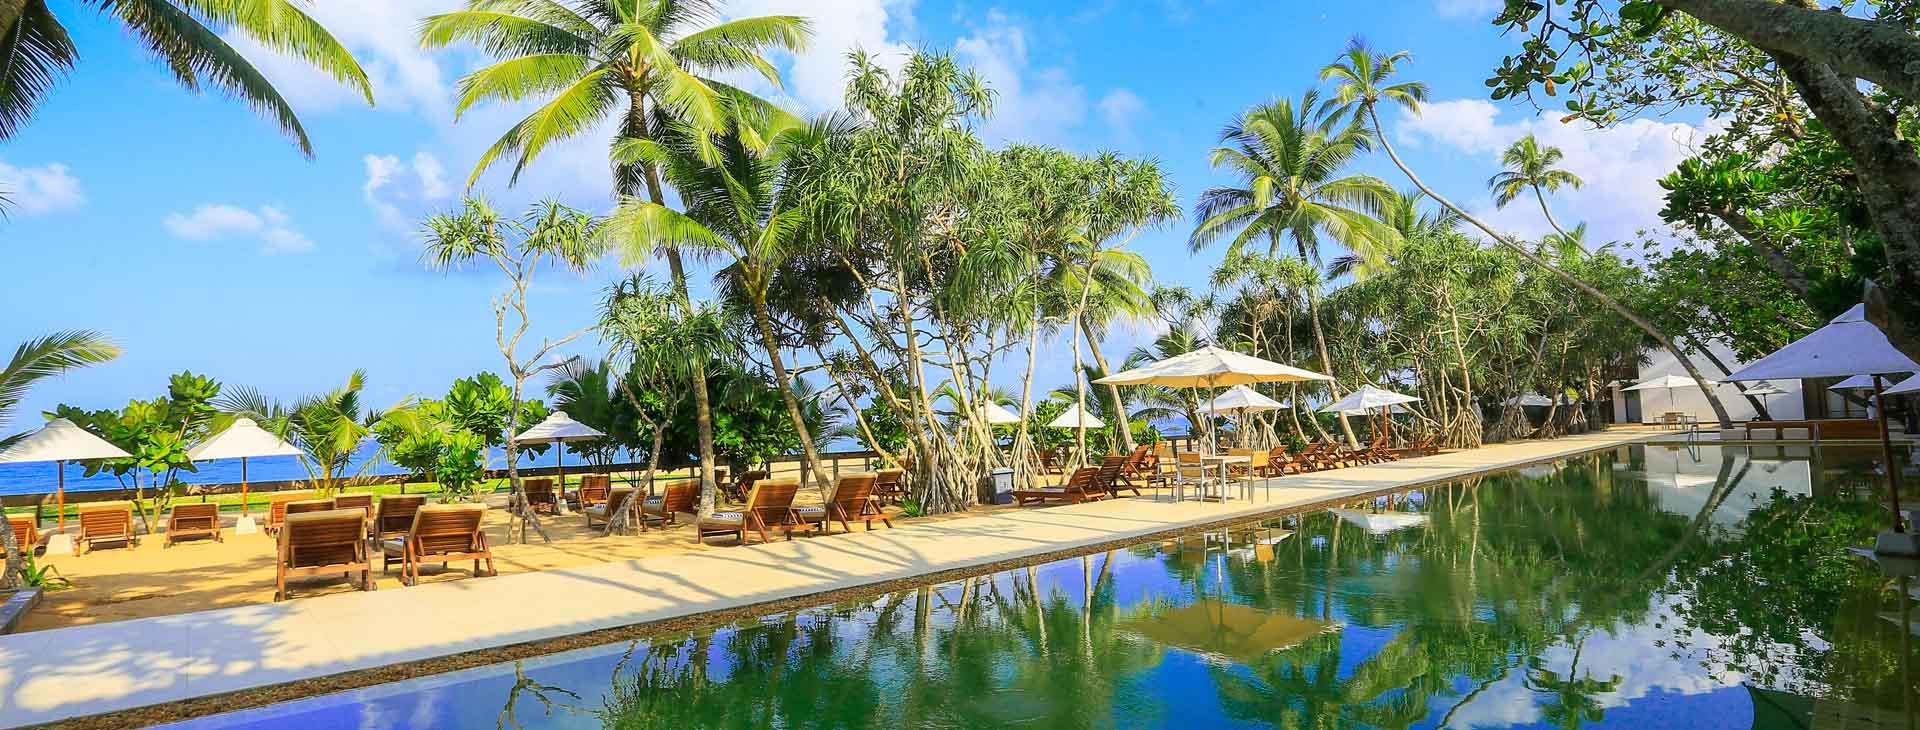 Pandanus Beach Resort and Spa (ex Emerald Bay) Sri Lanka Południowa Prowincja